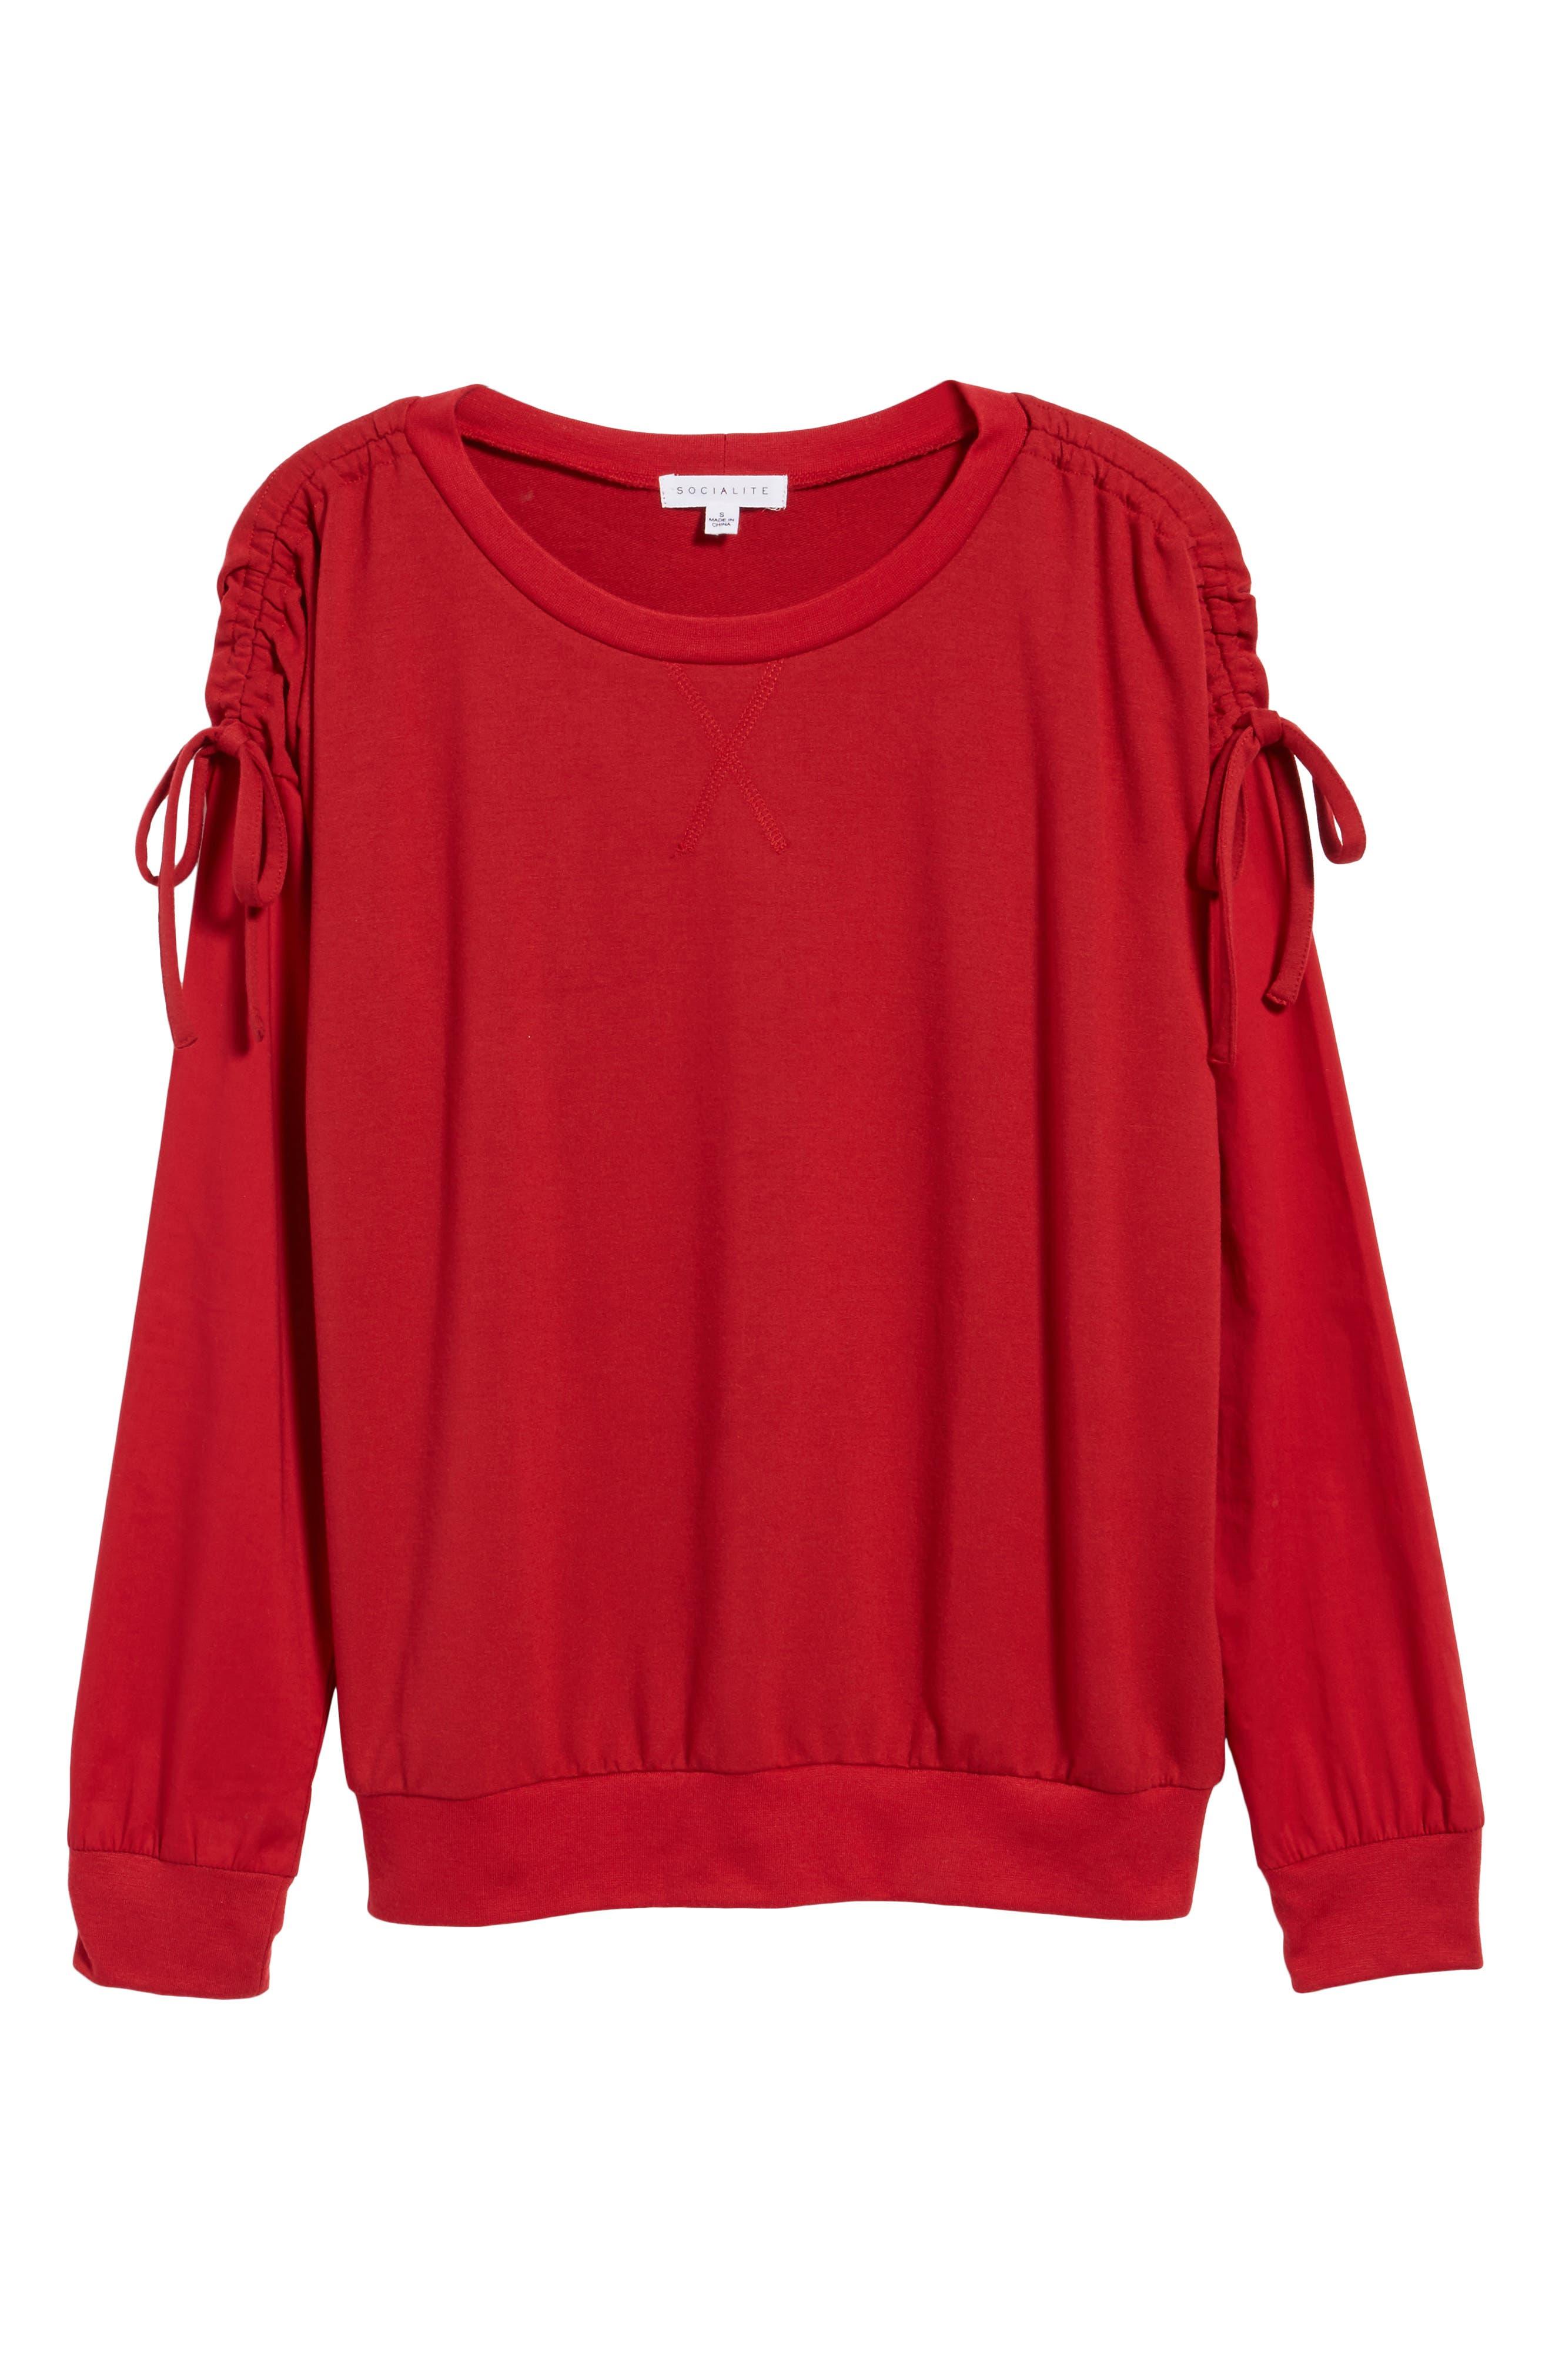 Cinch Sleeve Sweatshirt,                             Alternate thumbnail 6, color,                             603